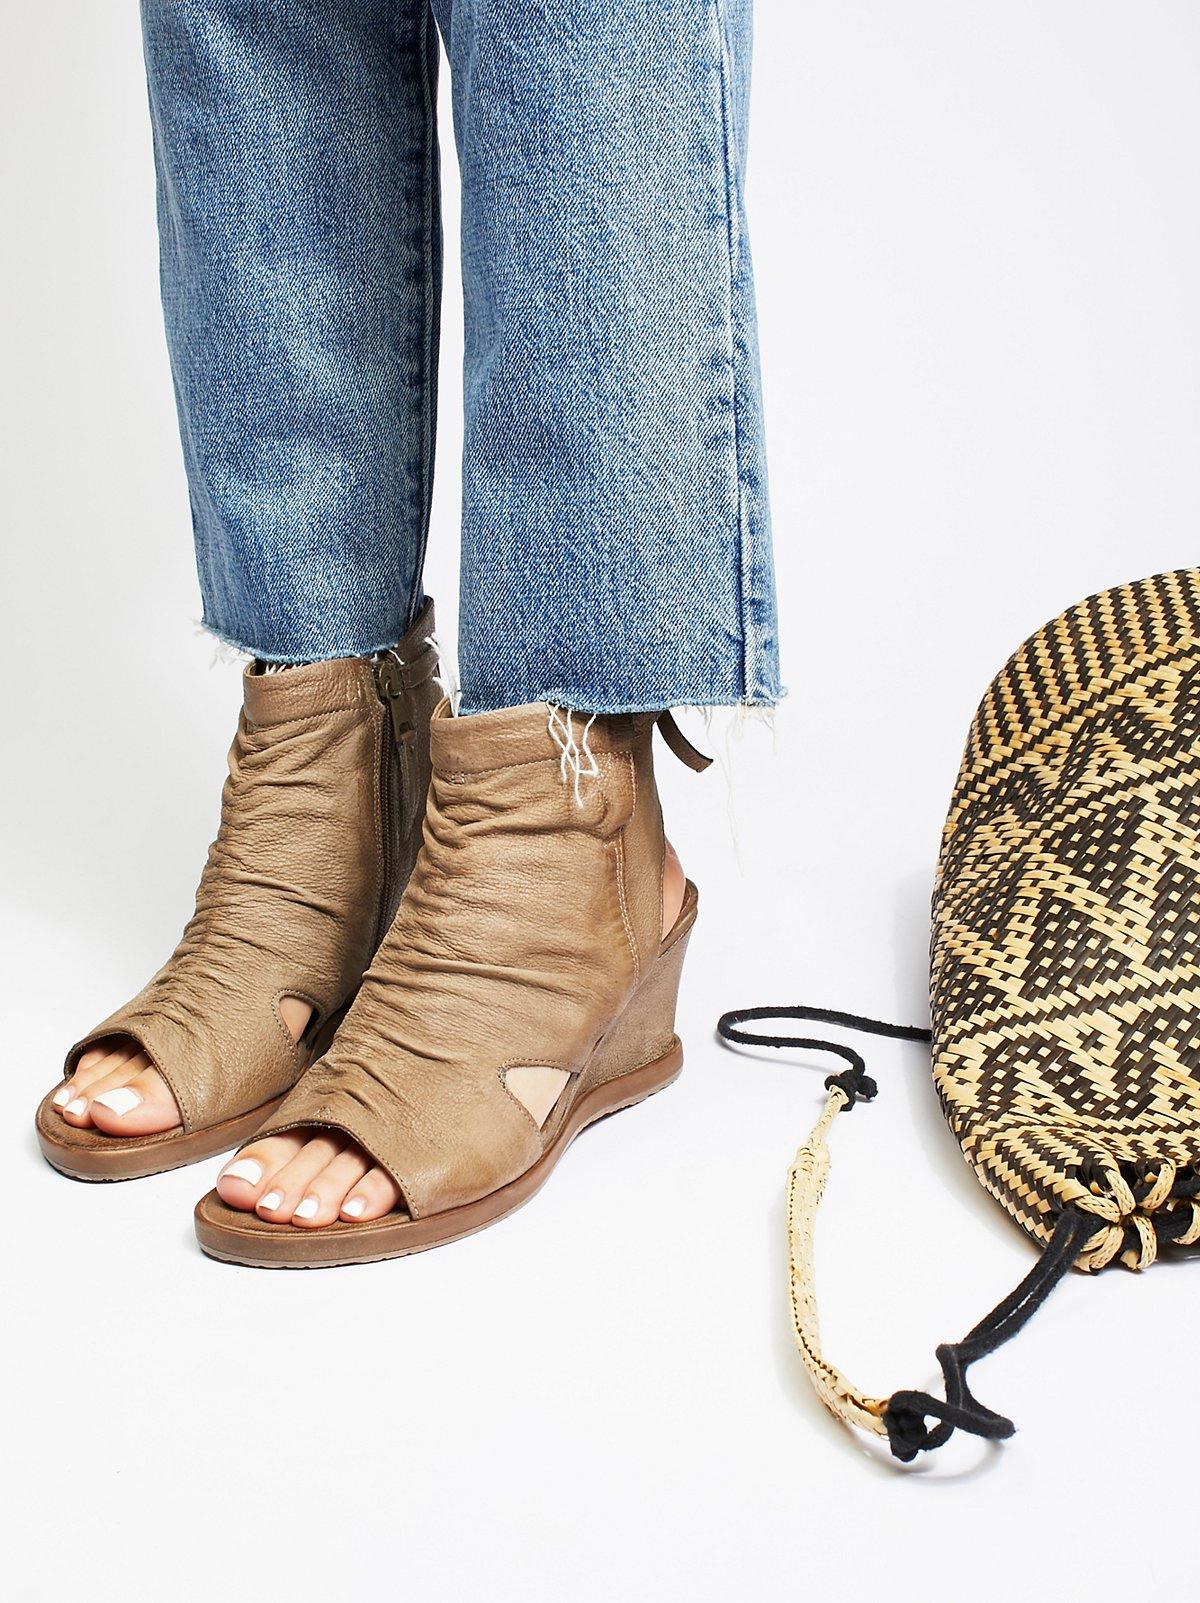 Becca坡跟鞋